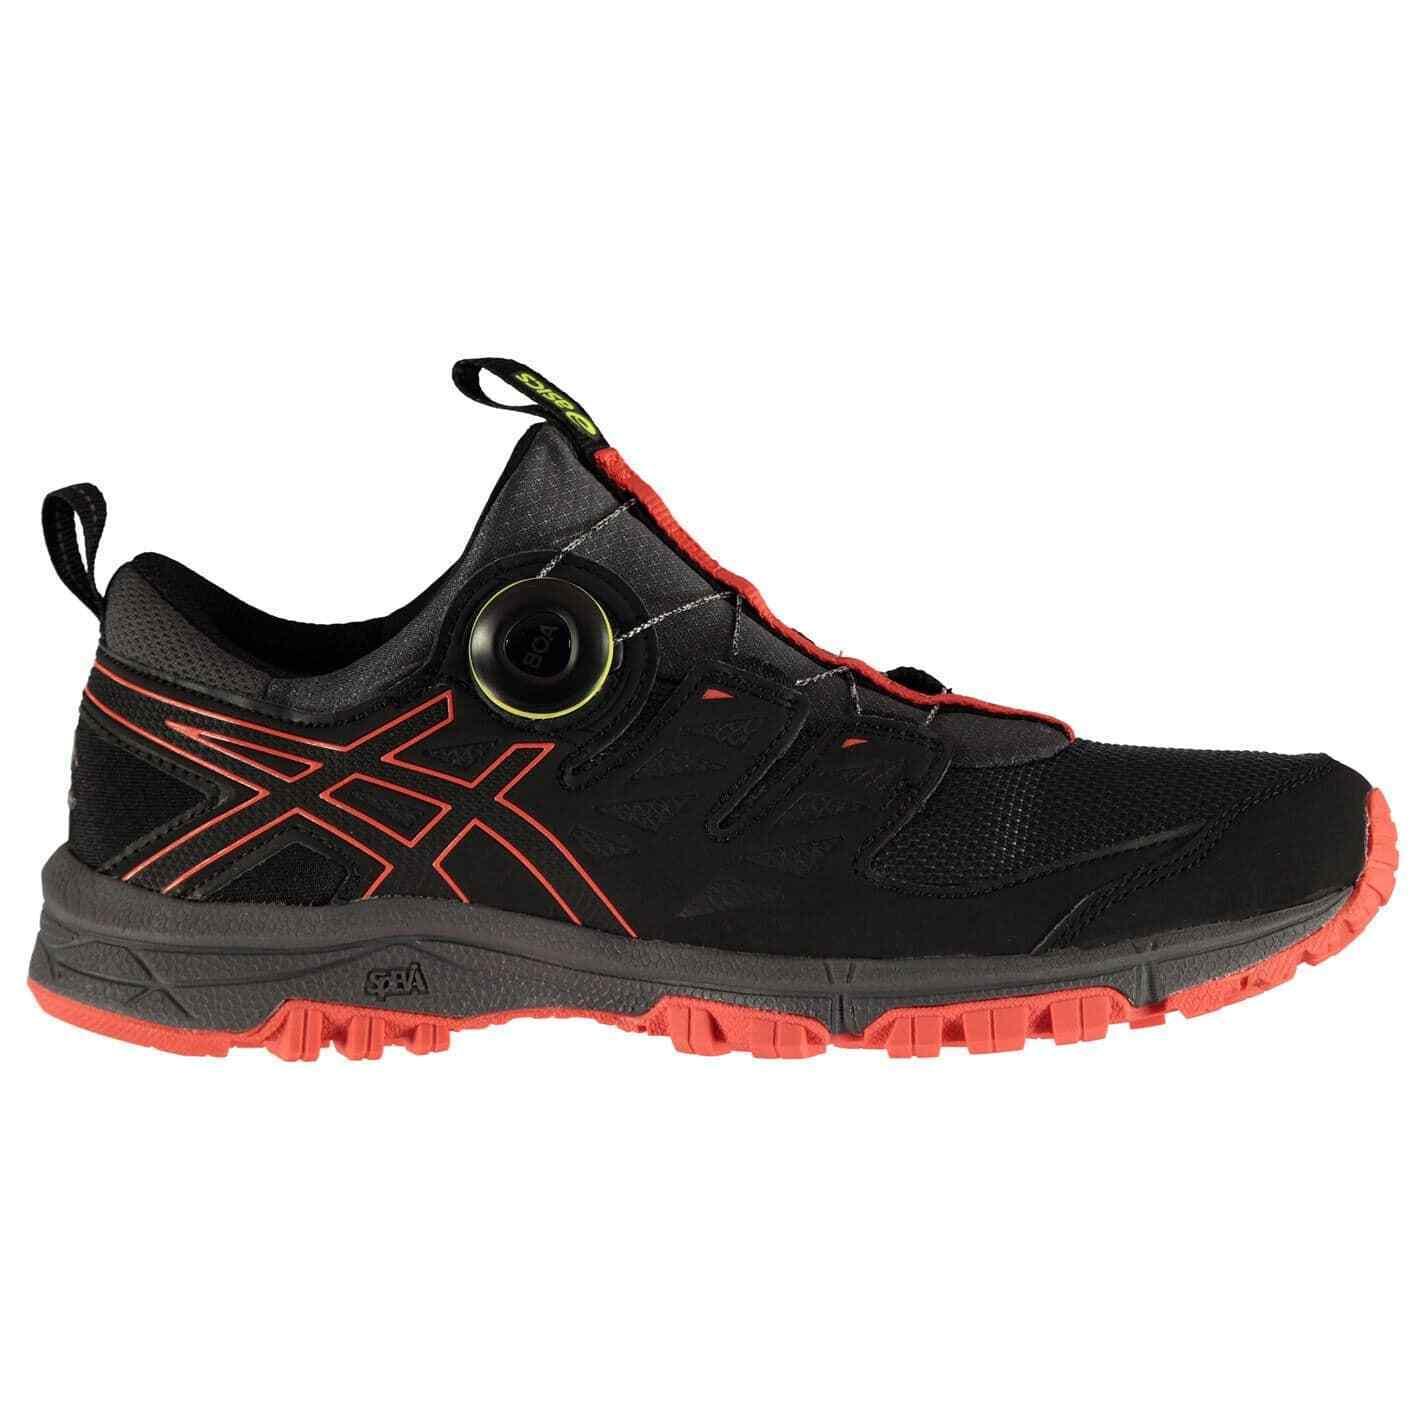 Asics mannens Gel FujiRado hardlopen schoenen Trail